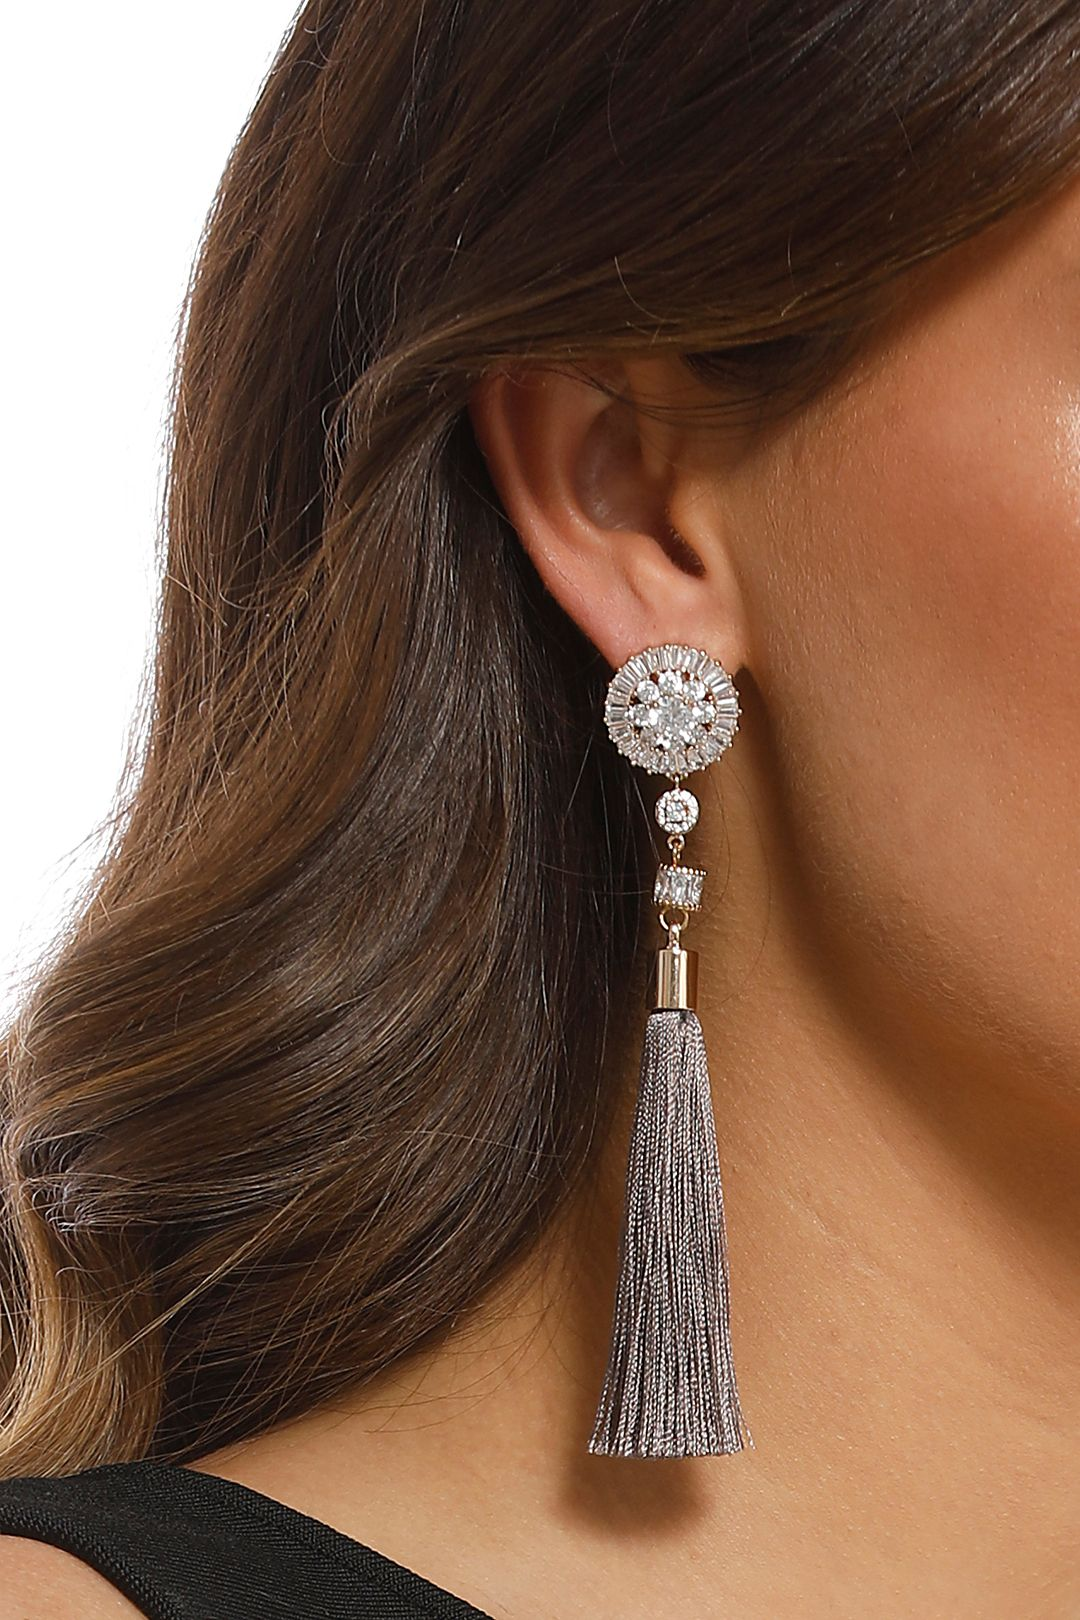 Adorne - Baguette Jewel Top Tassel Earrings - Gold Grey - Product